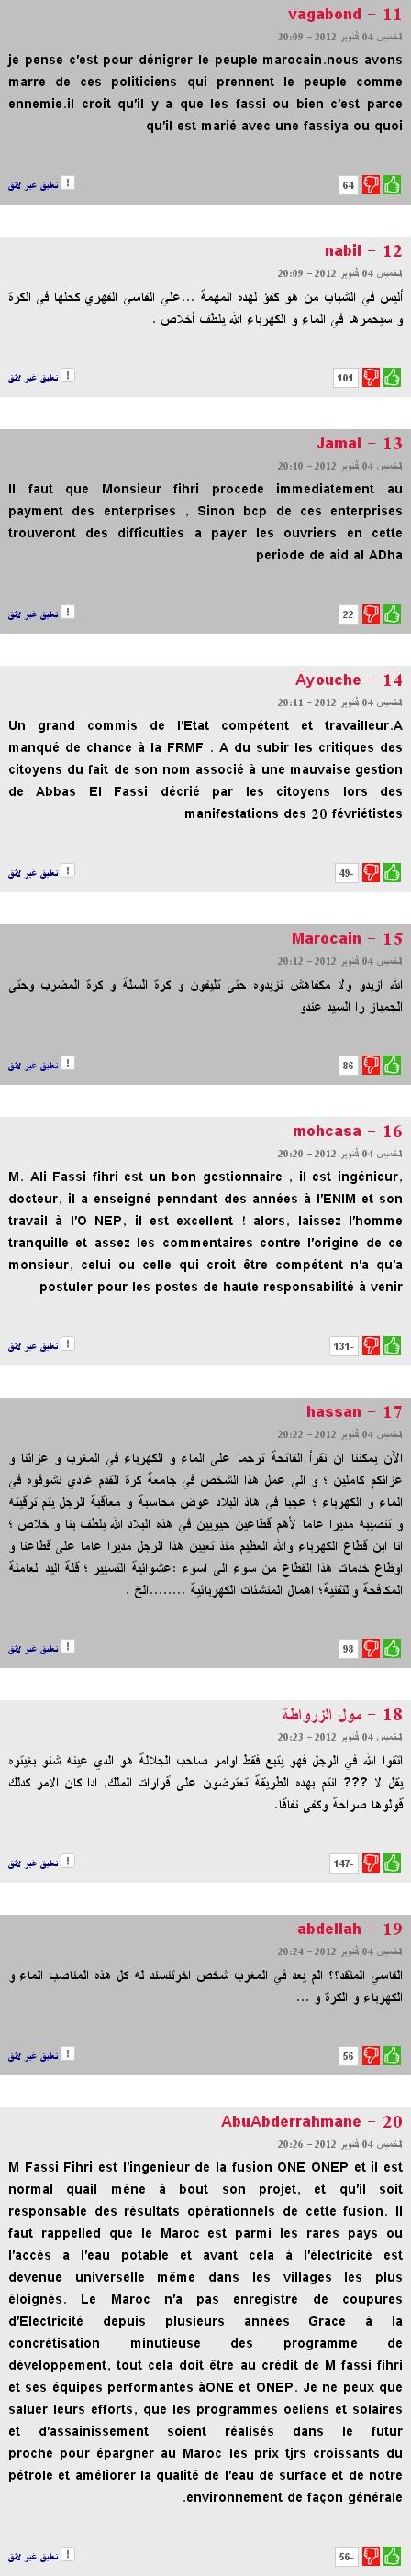 Réactions des marocains envers la nomination de ALi Fassi Ali210